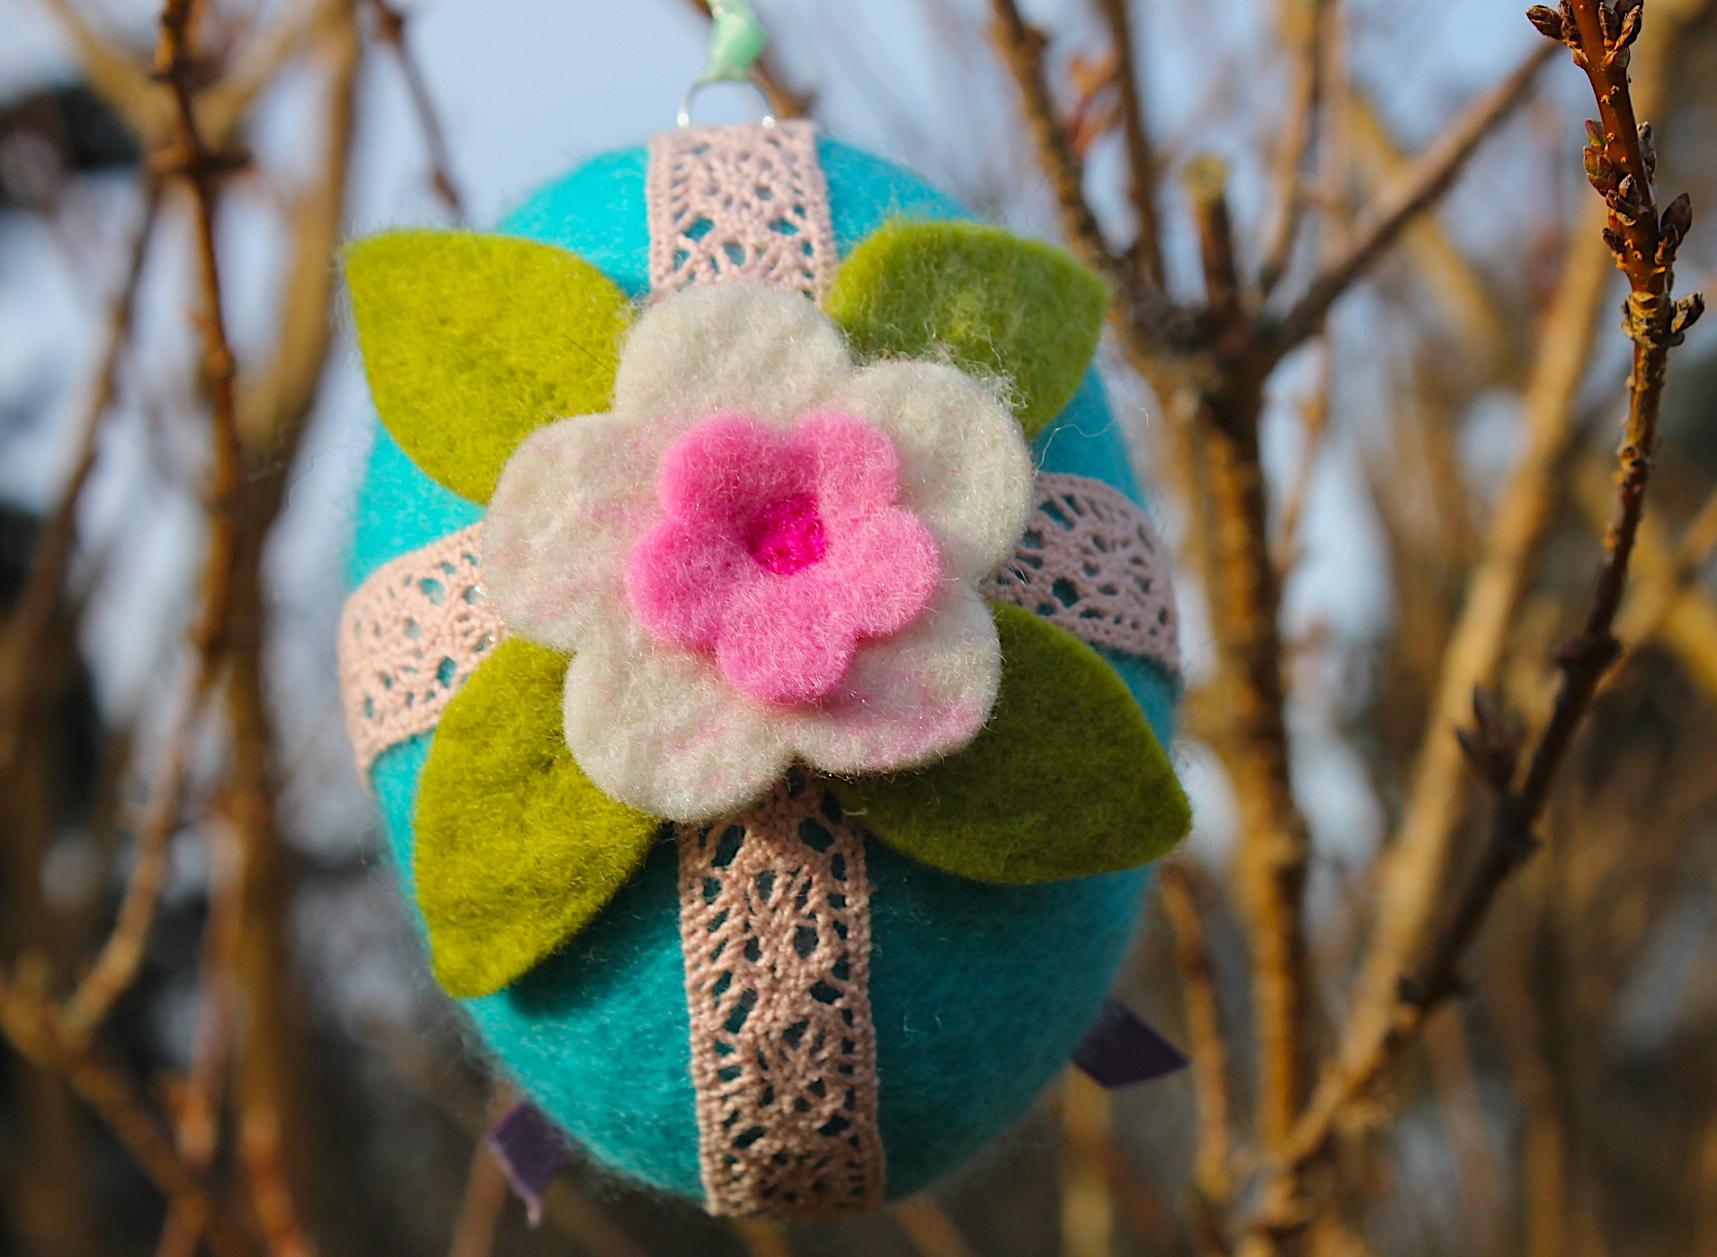 Shabby Chic Colors Style : Decorações em candy colors e tons pastel inspiration shabby